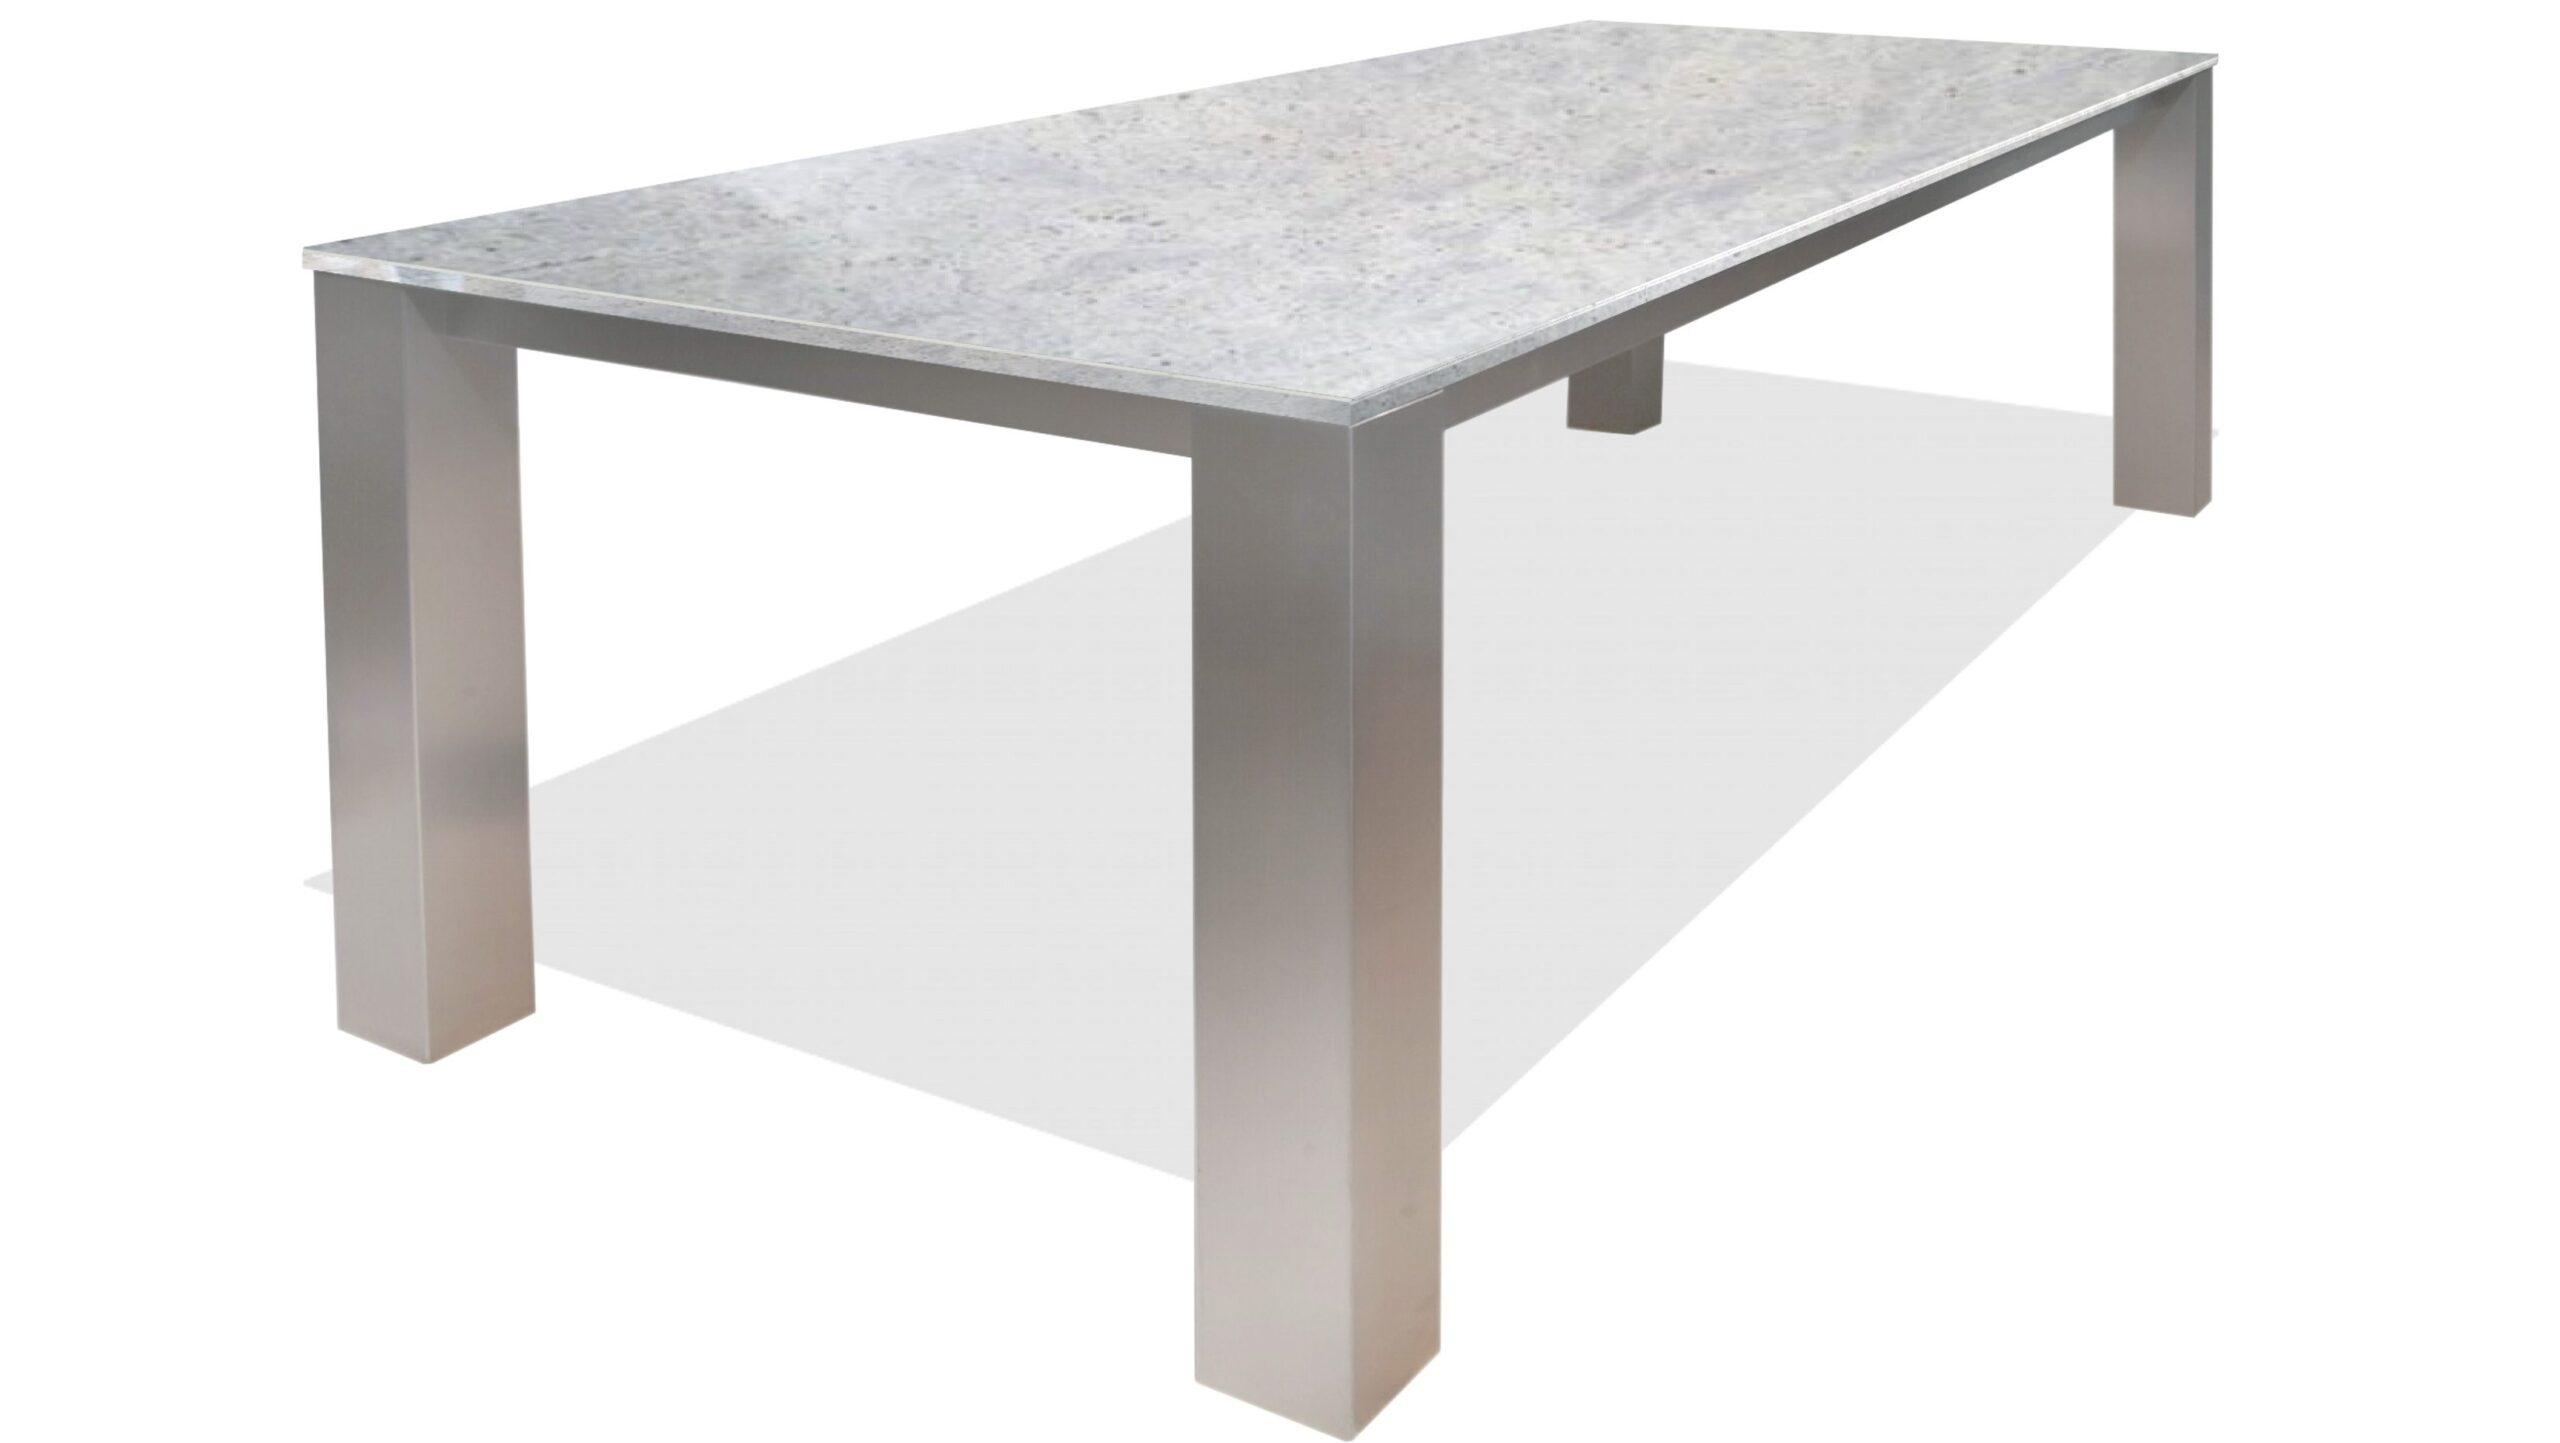 Full Size of Esstische Granit Collection Rompf Massiv Runde Moderne Designer Kleine Holz Ausziehbar Massivholz Rund Design Esstische Esstische